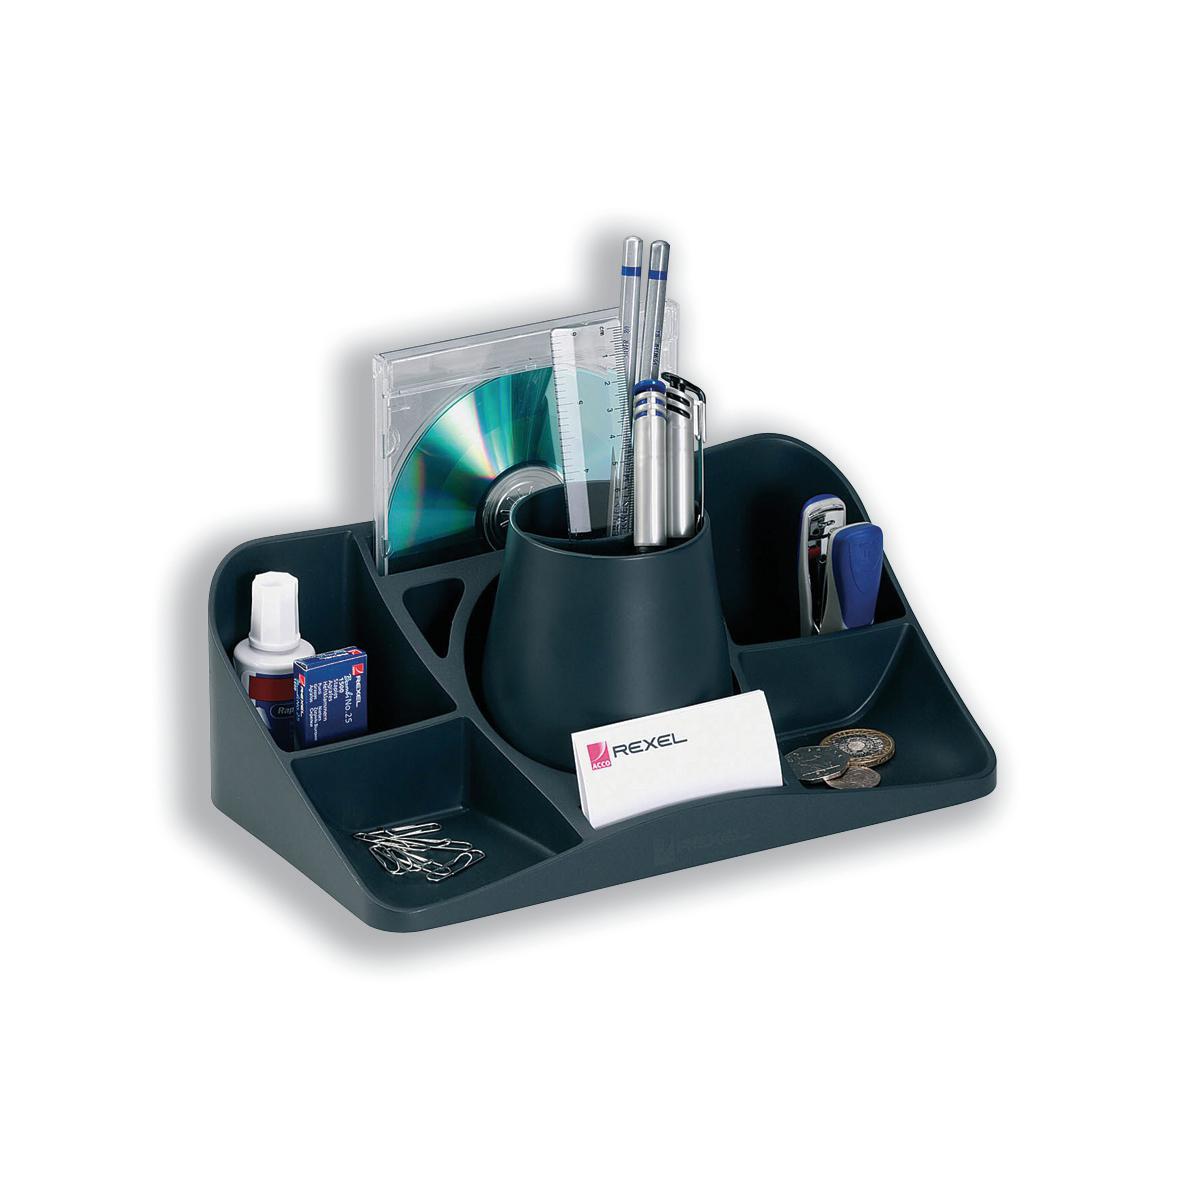 Rexel Agenda 2 Desk Tidy Charcoal Ref 2101028